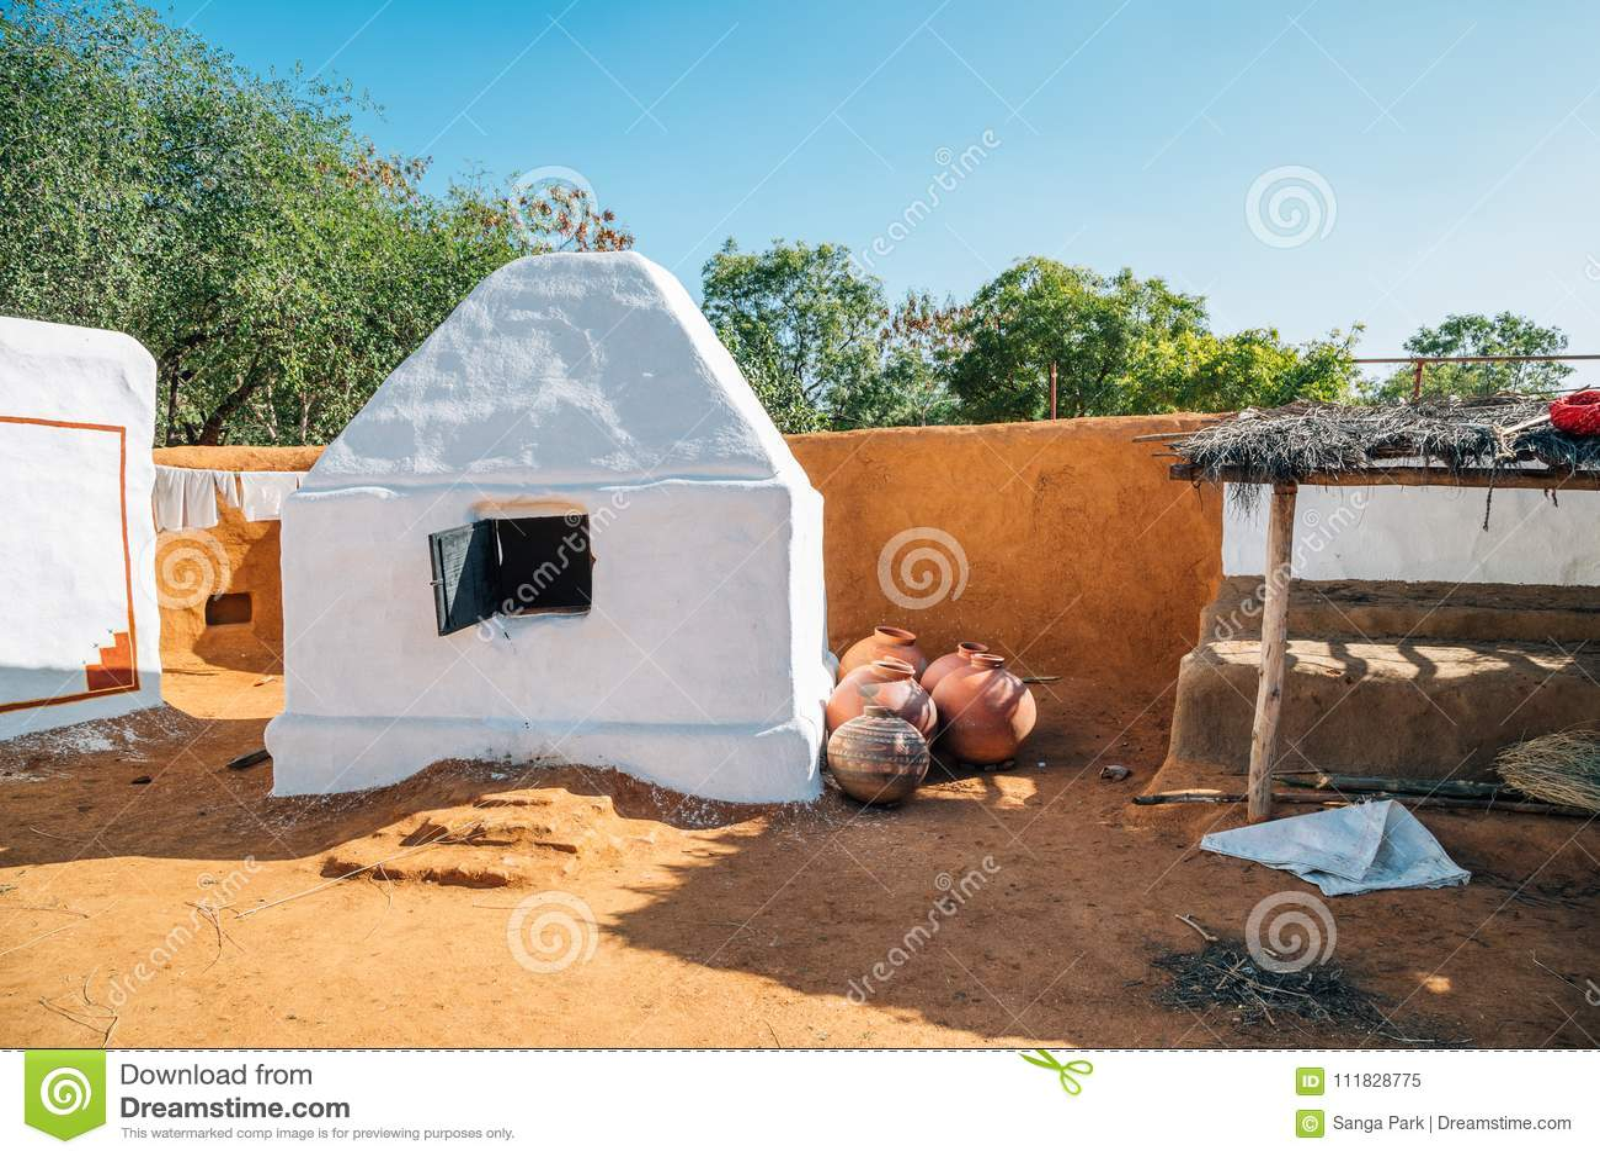 Traditional kiln at Indian folk village Shilpgram in Udaipur, India